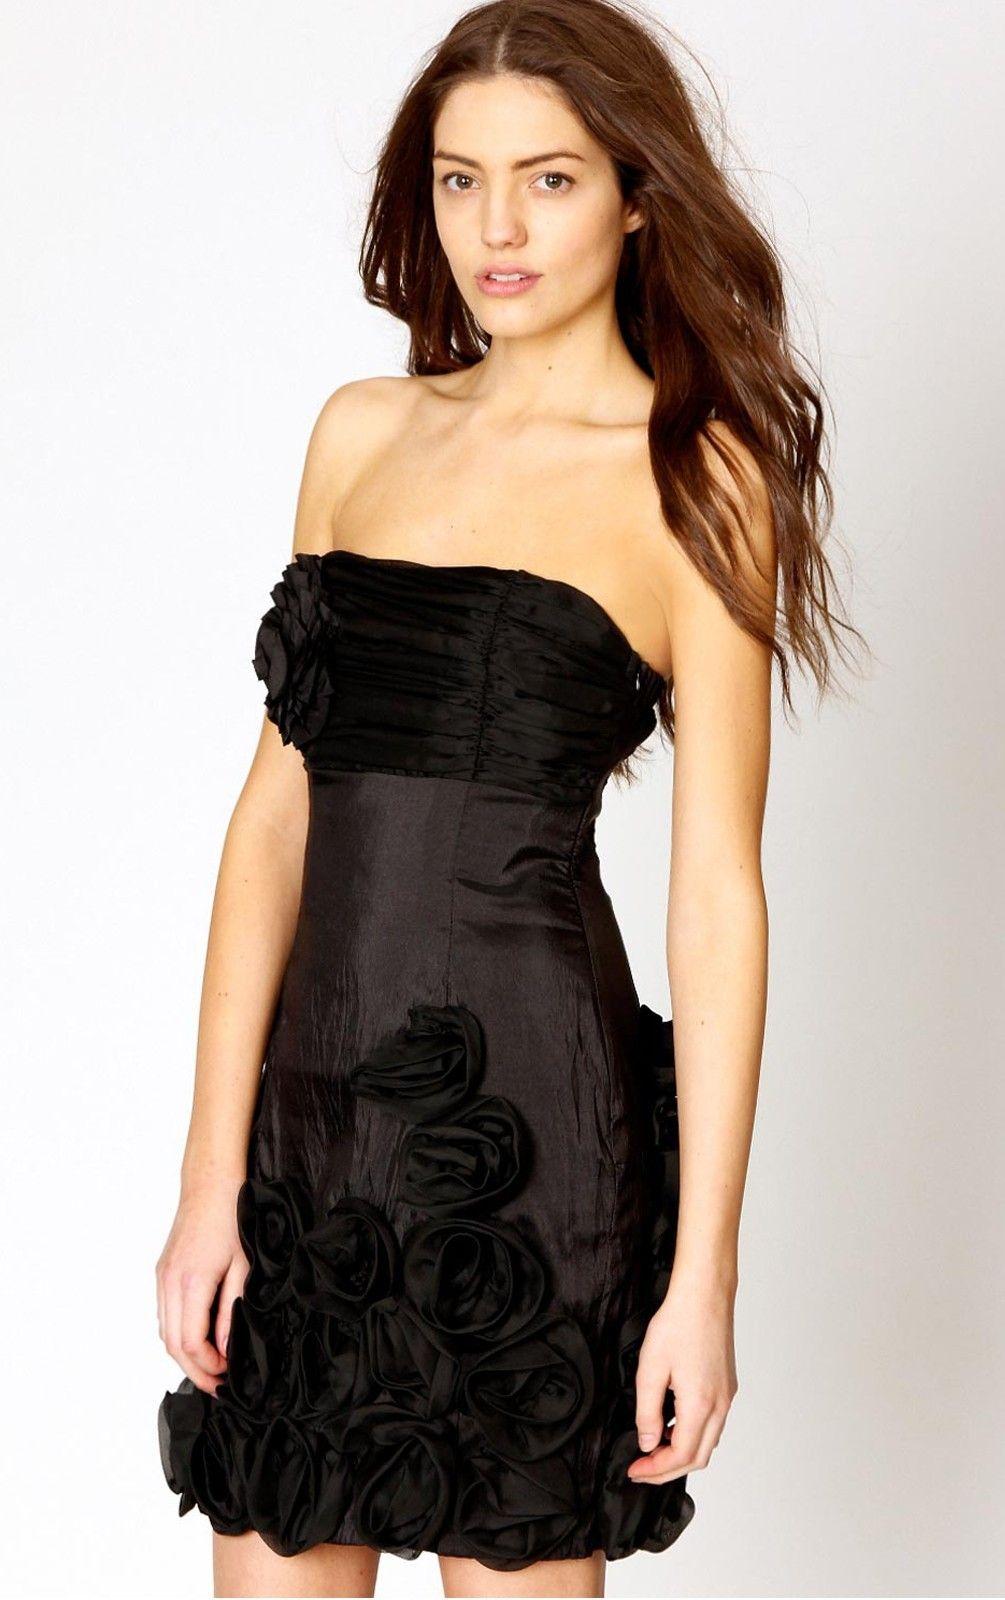 Semi formal dresses for wedding reception  Delicate Sleeveless Mini Strapless Taffeta Sheath Cocktail Dresses